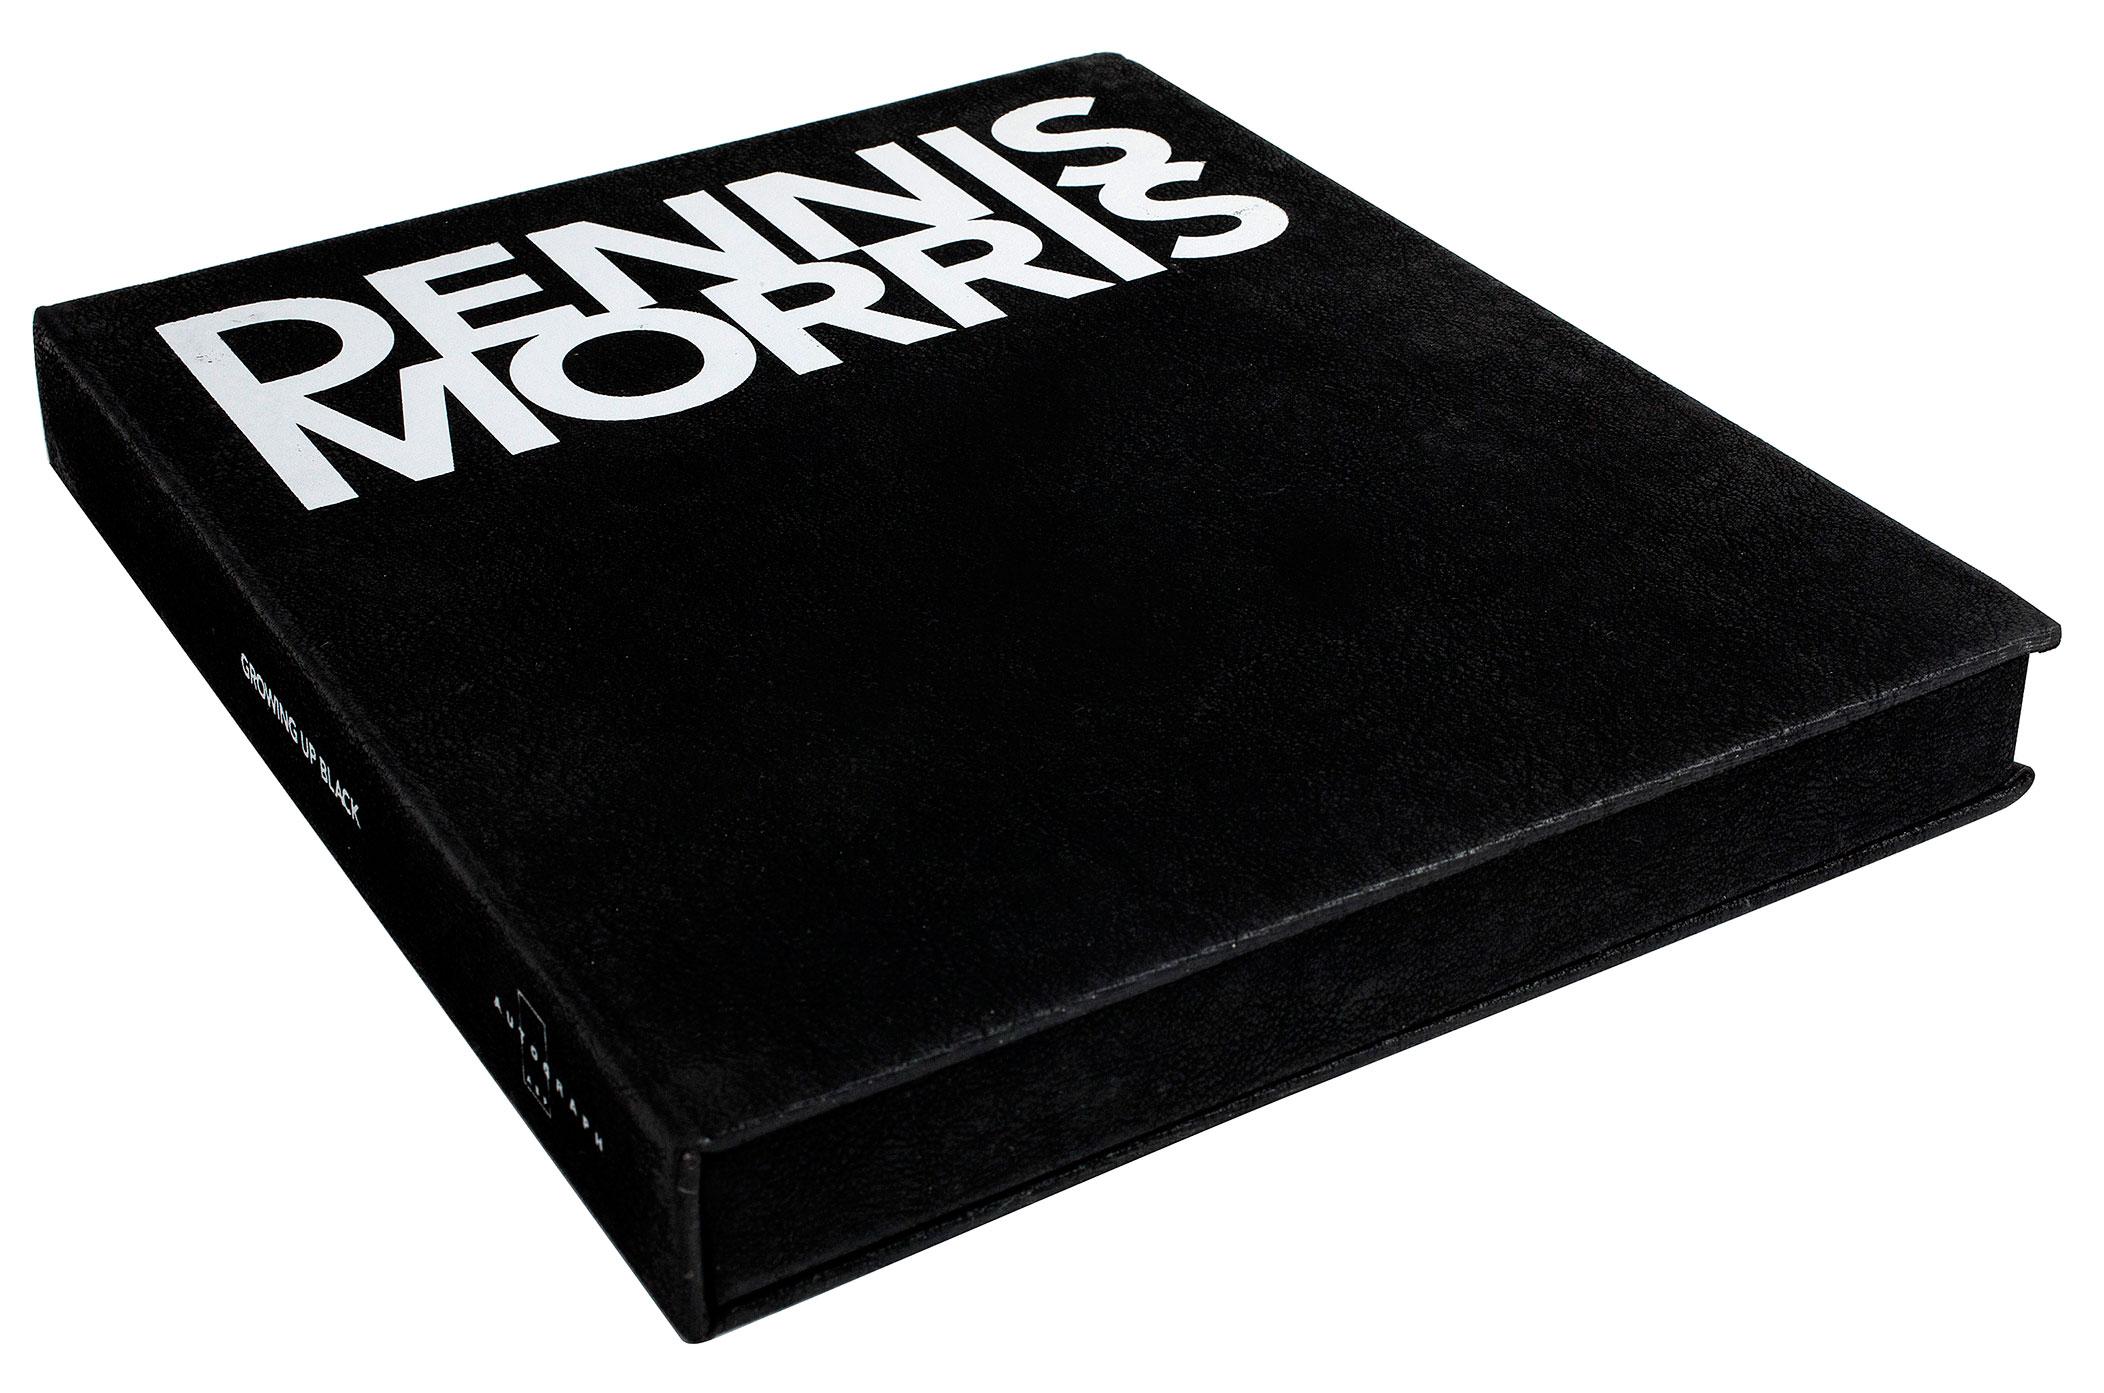 Dennis Morris - Growing Up Black